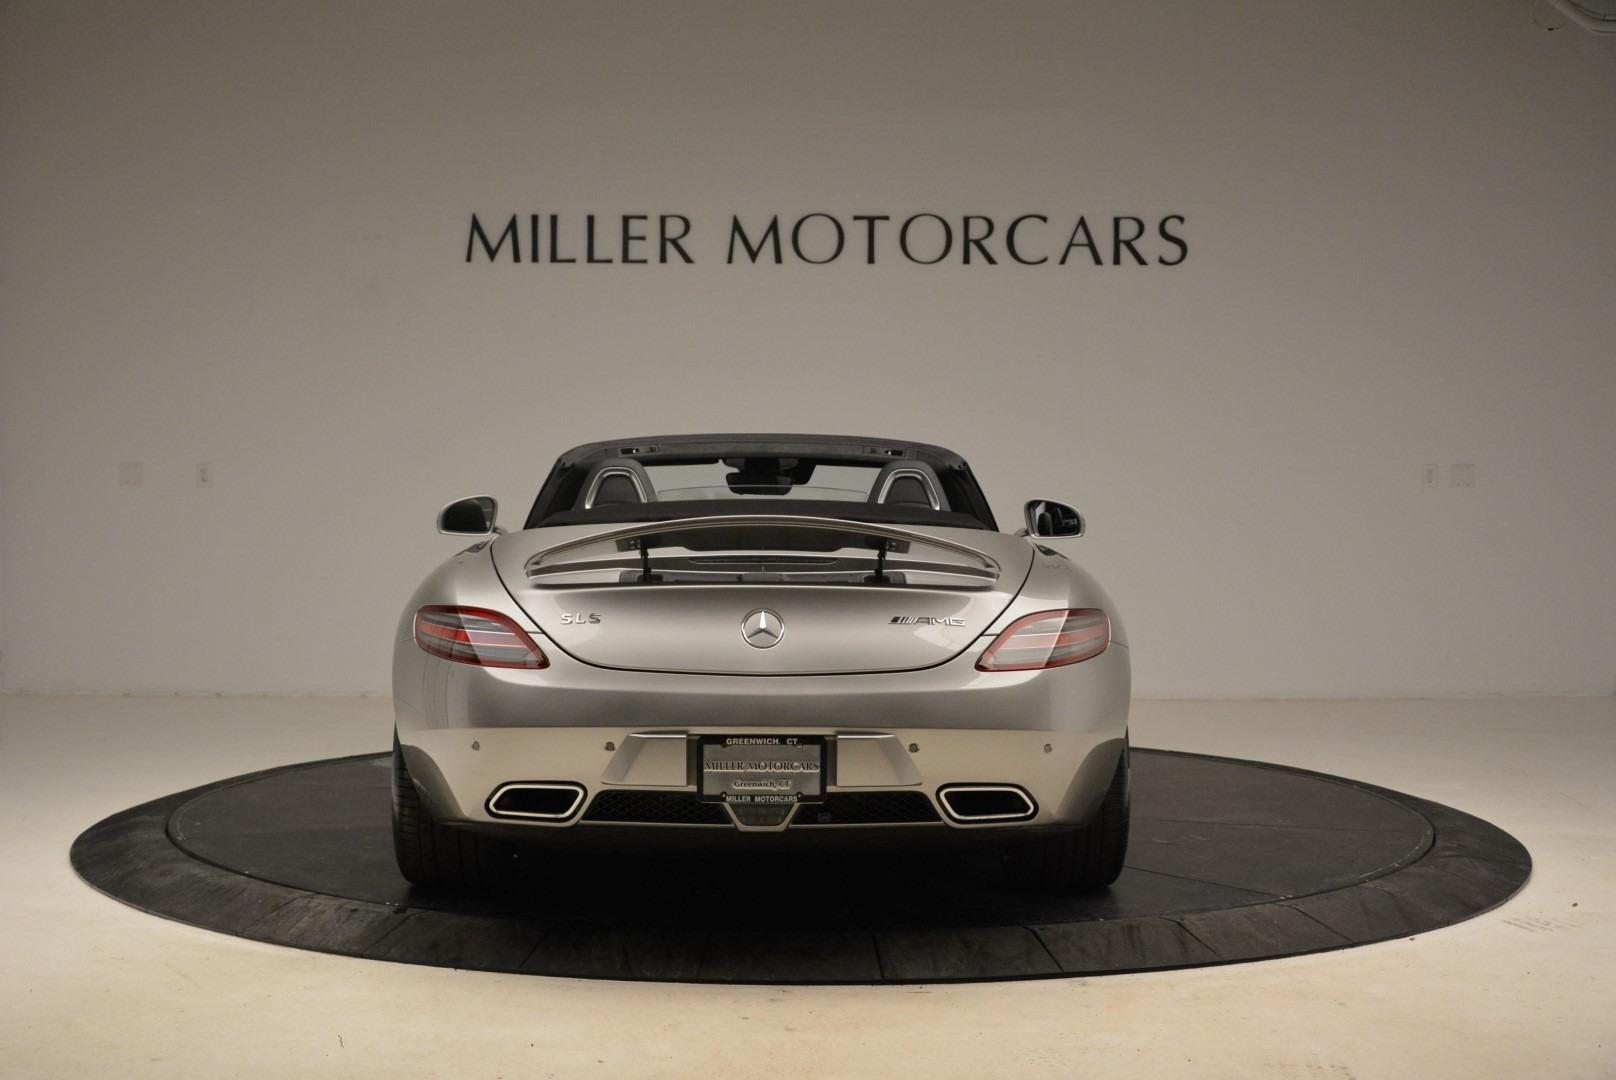 Used 2012 Mercedes-Benz SLS AMG  For Sale In Westport, CT 2068_p6